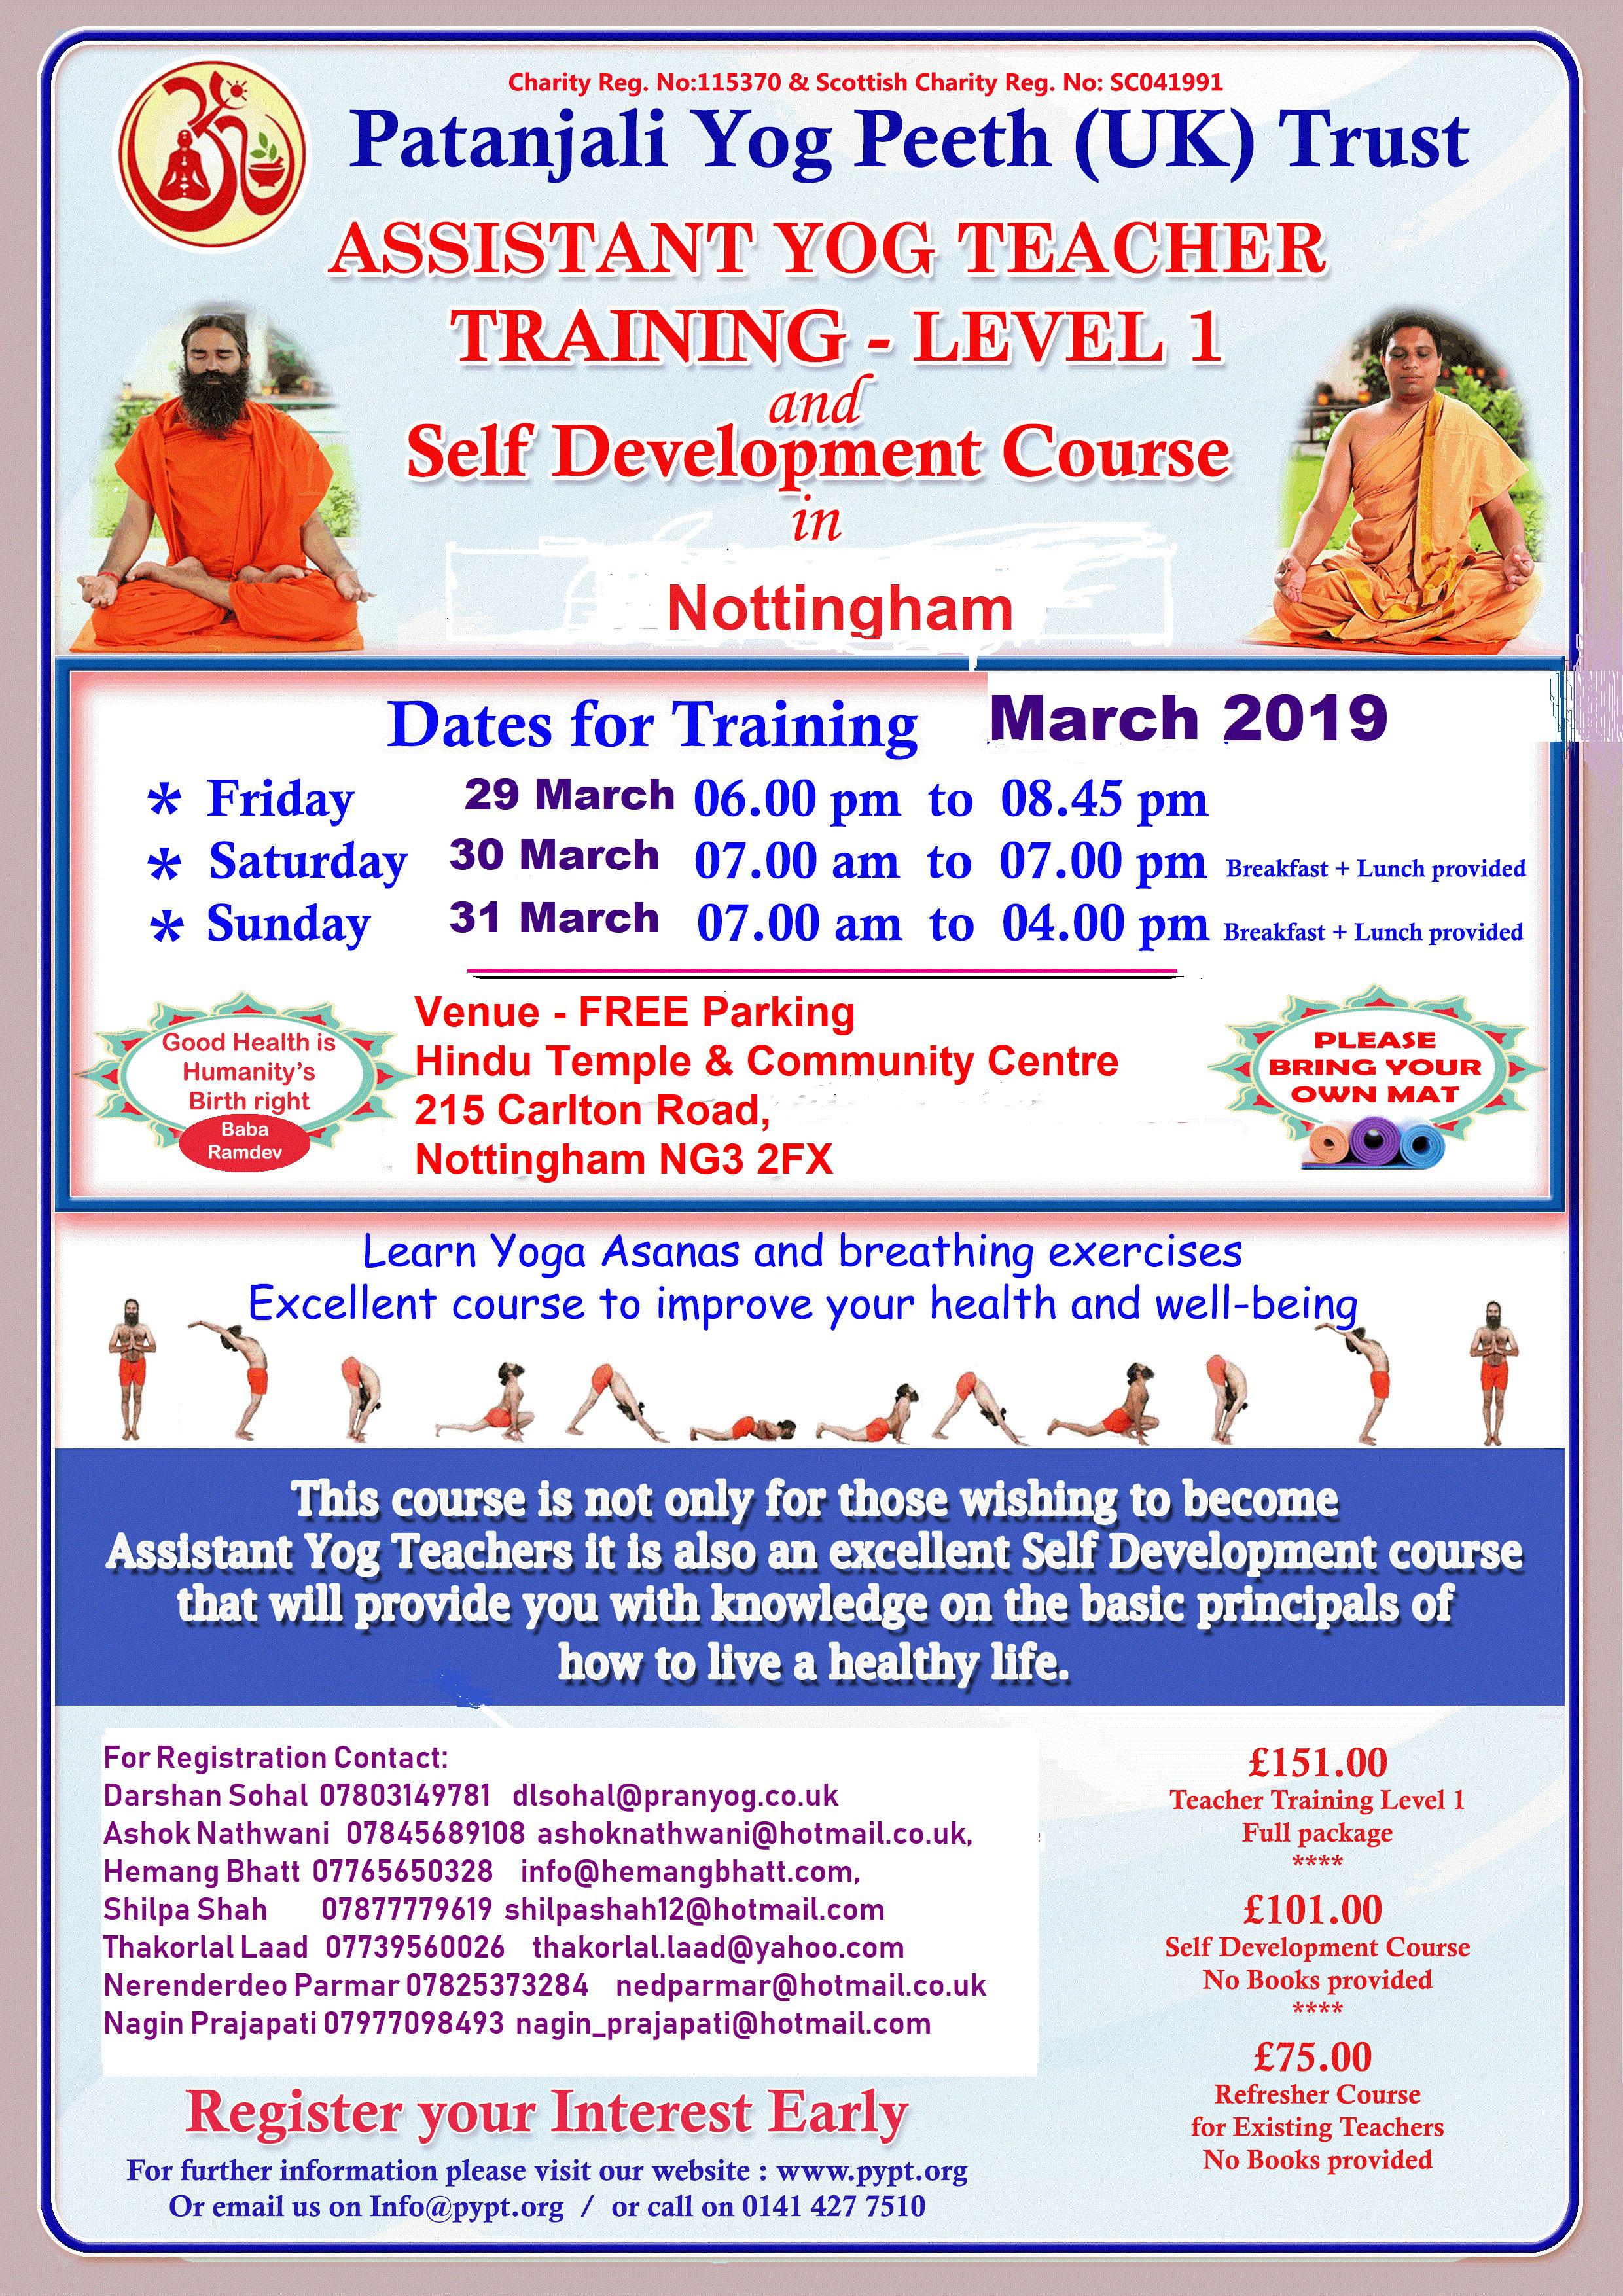 Assistant Yog Teachers' Training in 2019 | Swami Ramdev | Patanjali